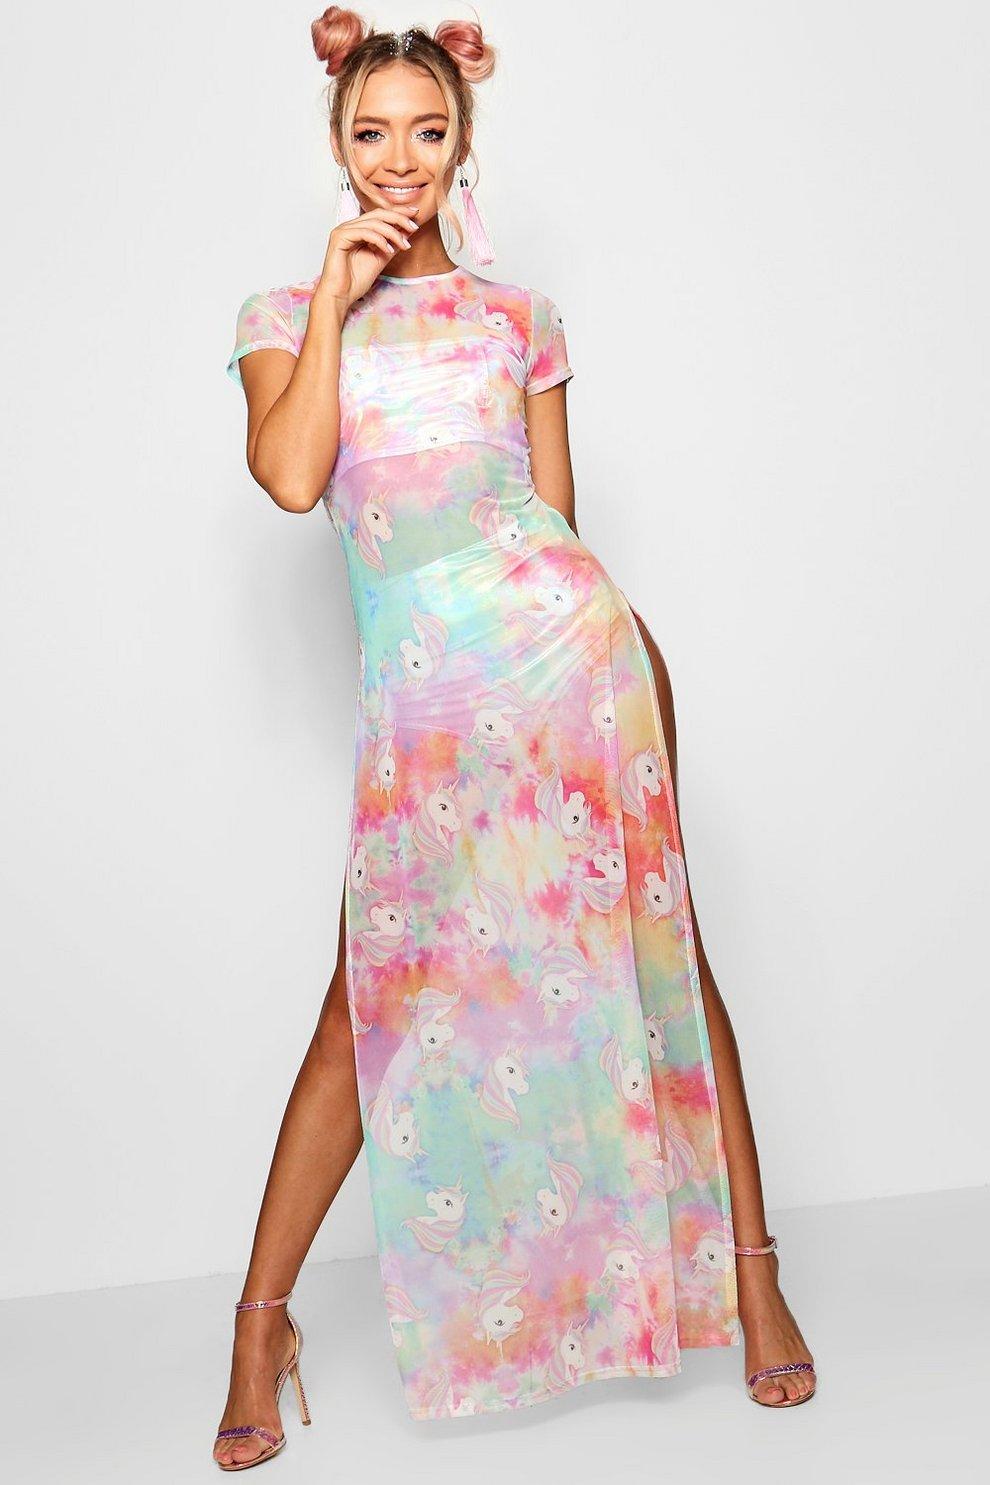 f69a07a0b44 Unicorn Tie Dye Printed Mesh Maxi Dress